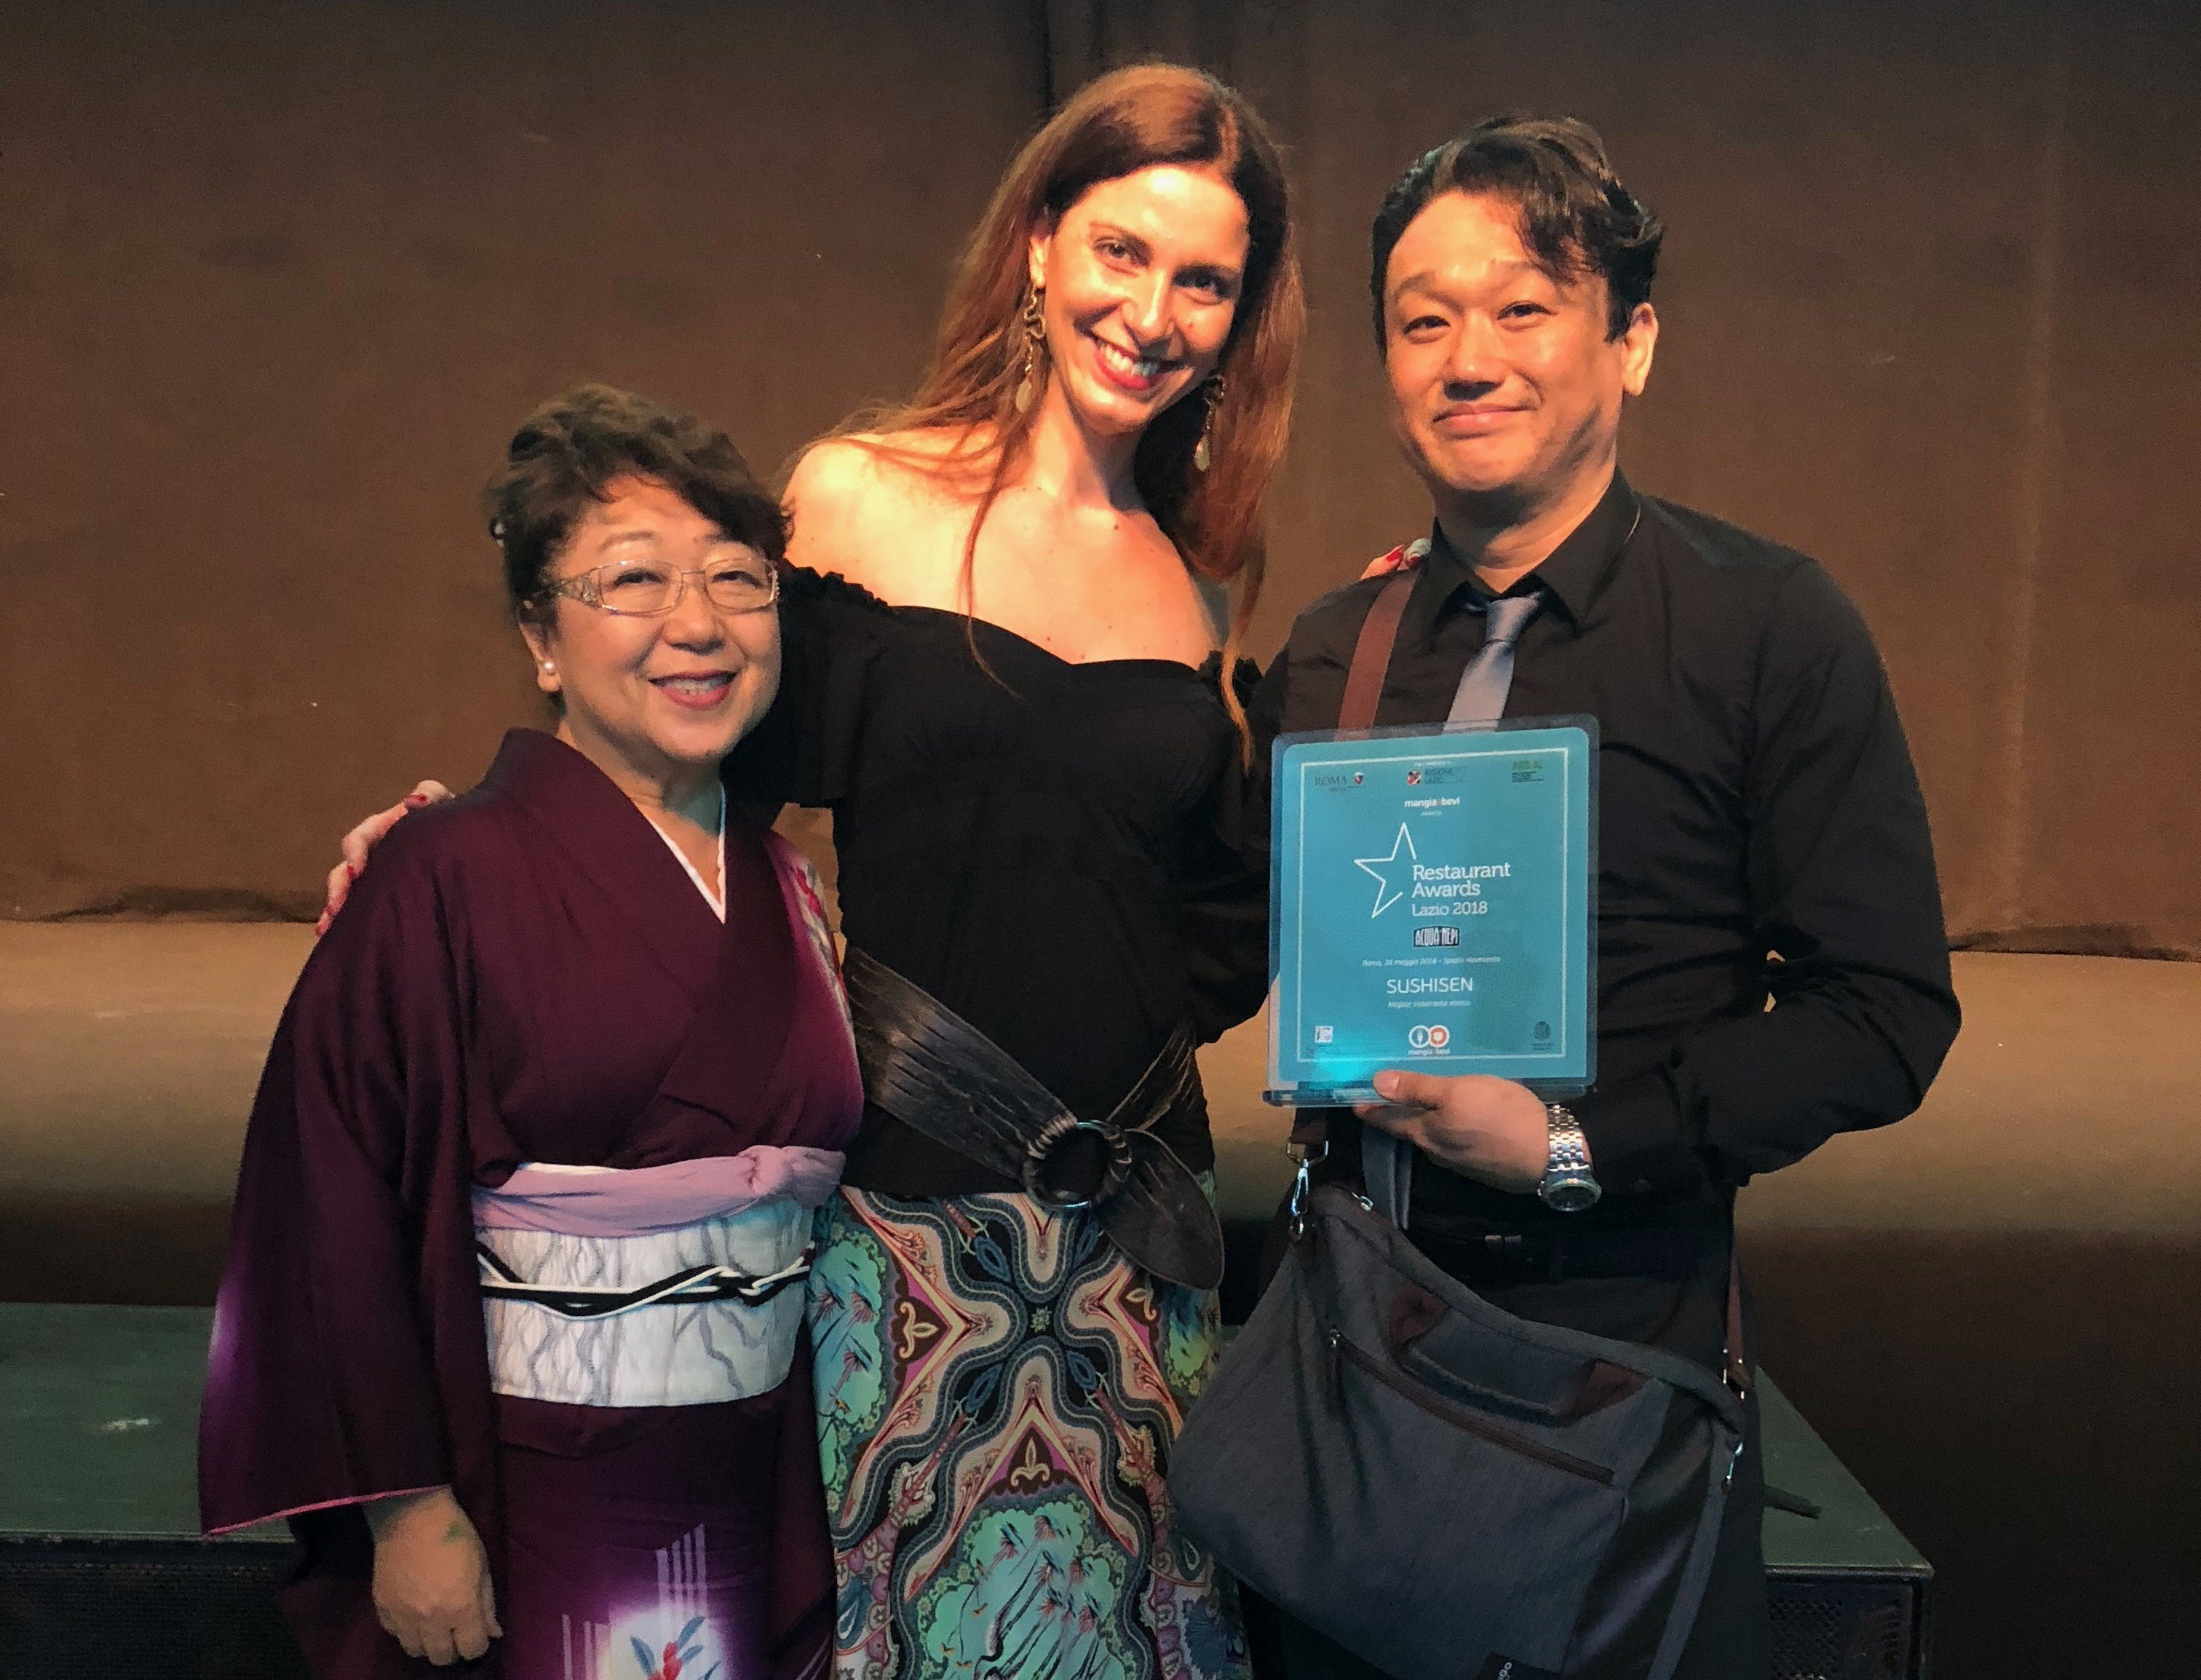 Il vincitore Sushisen